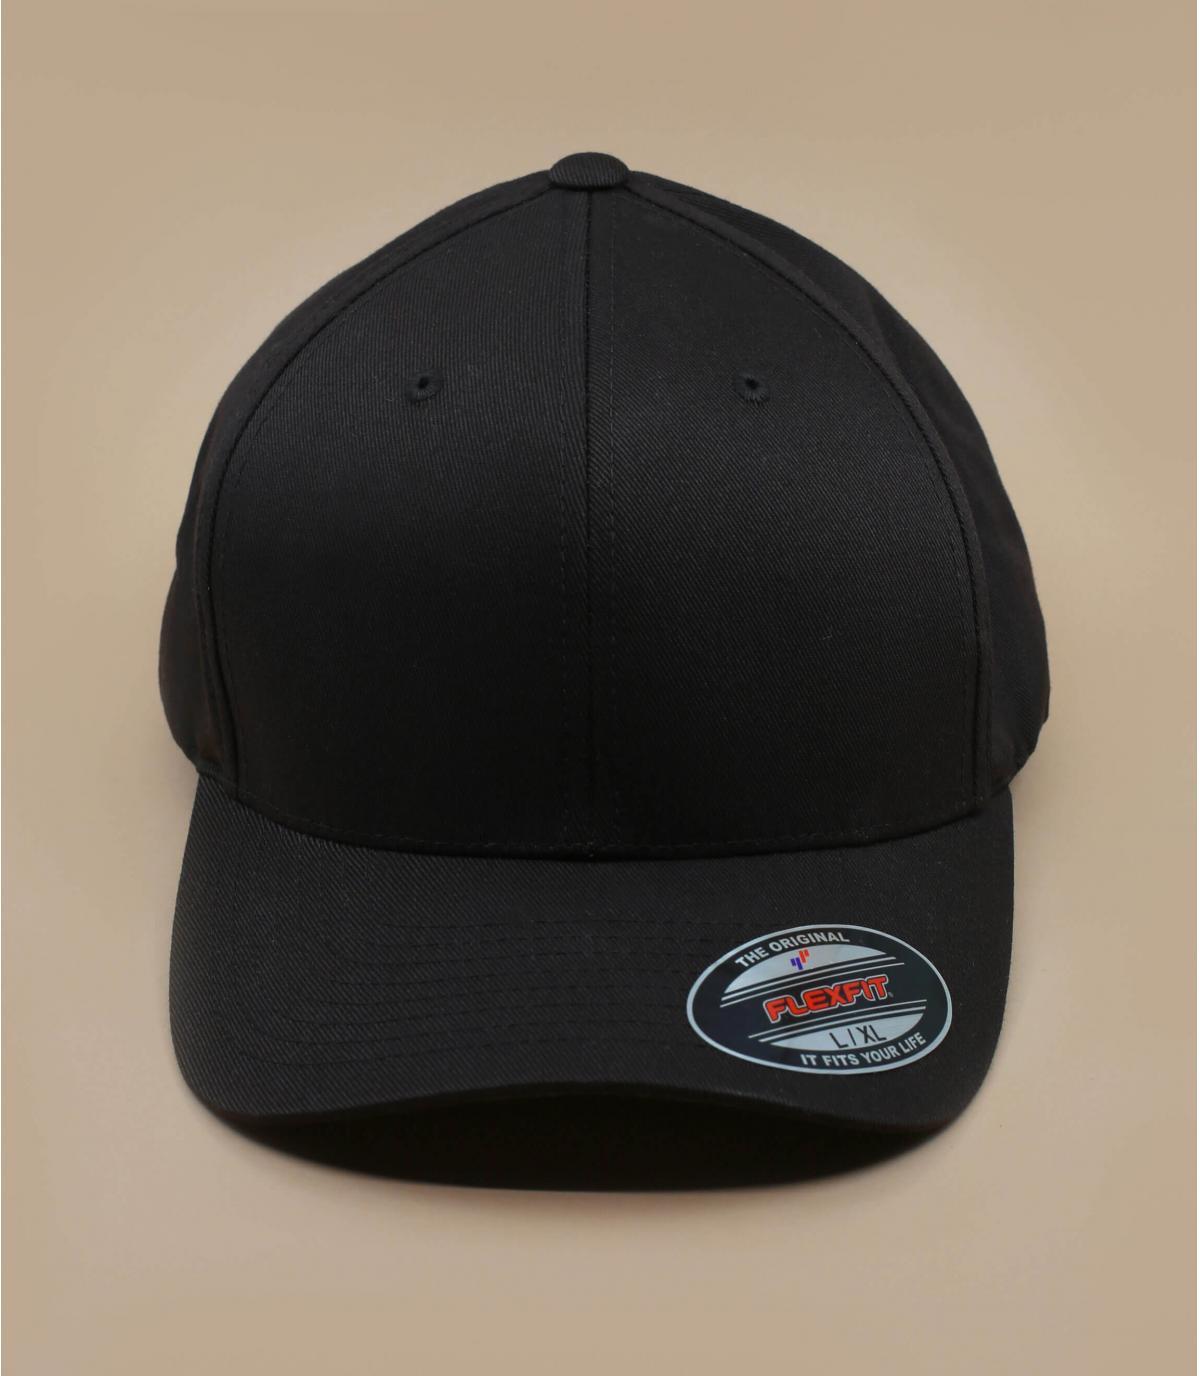 Flexfit cap brown